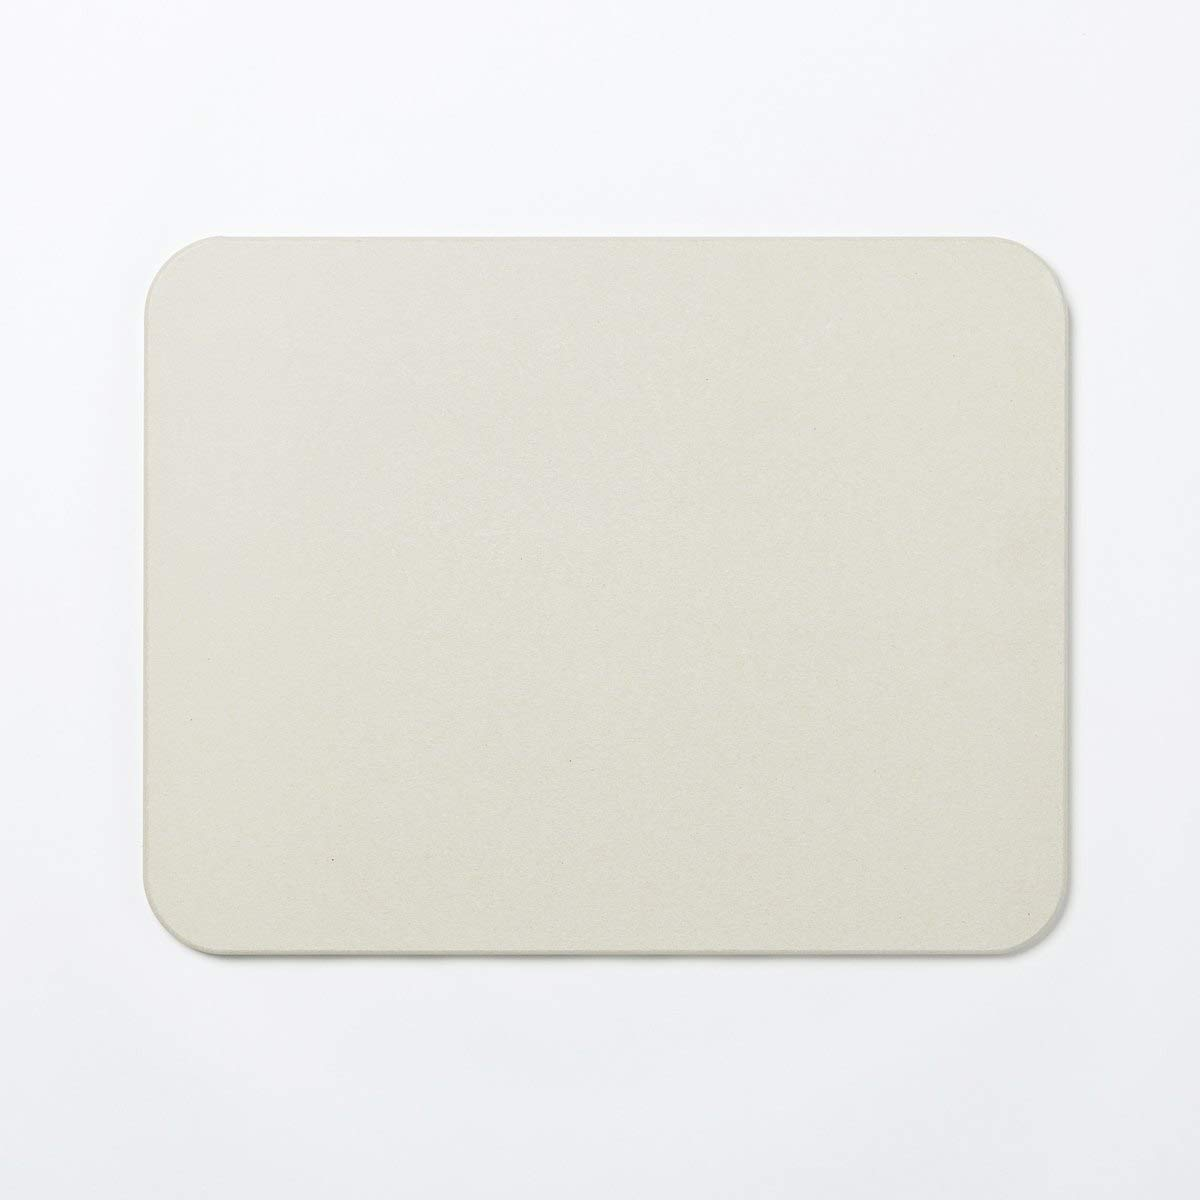 Kyūjōto Bathroom Mat, Gray - 14 x 18 x 0.4 inches & 350 x 450 x 10 mm